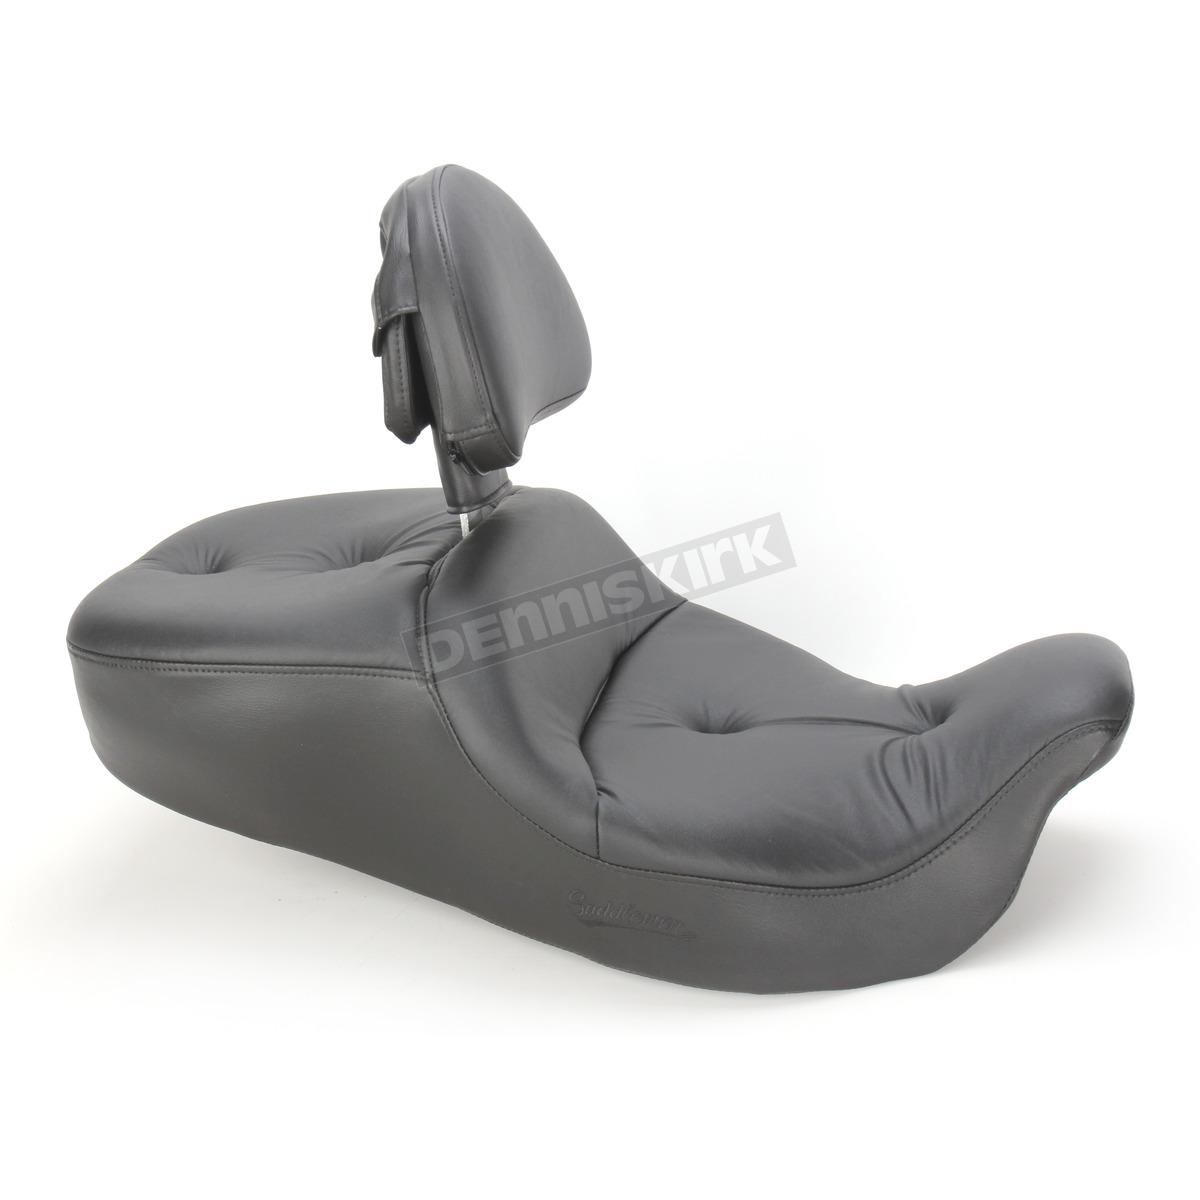 road sofa harley flexsteel sofas and loveseats saddlemen heated seat 808 021 085h